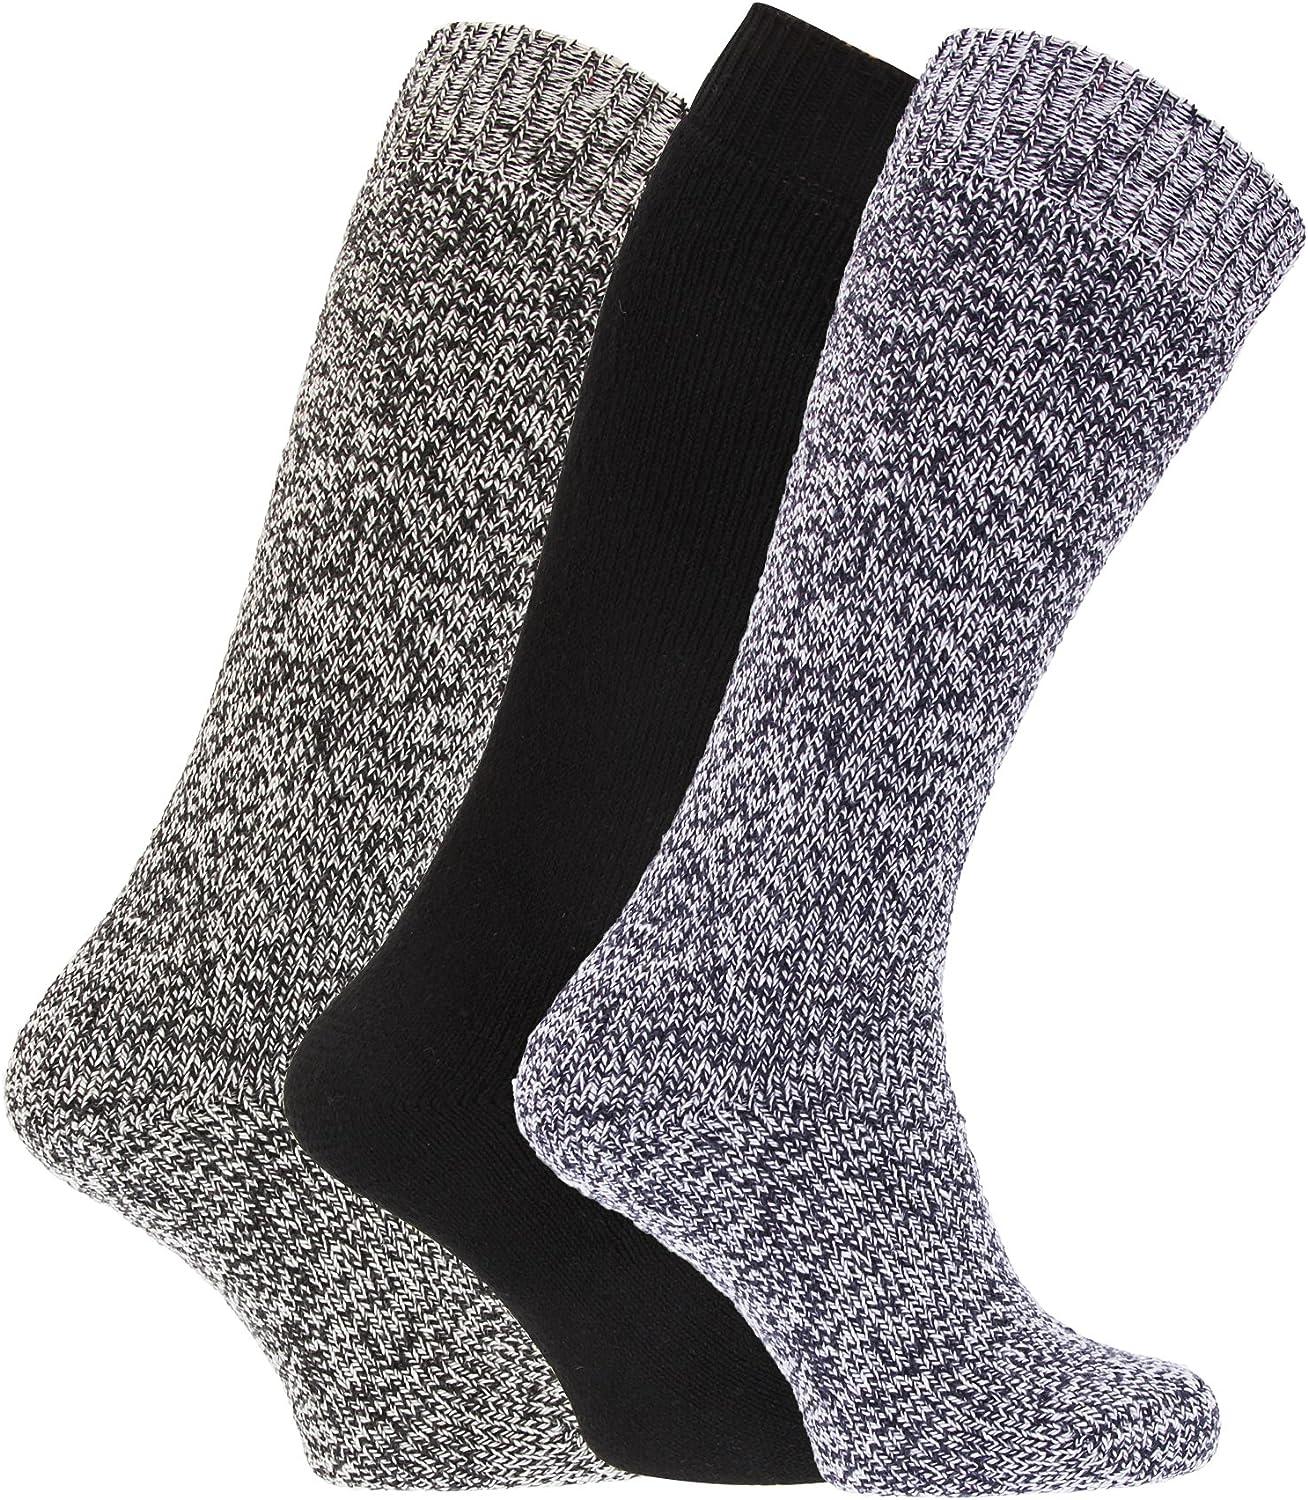 MB147 Pack Of 3 Mens Thermal Wool Blend Long Wellington Boot Socks